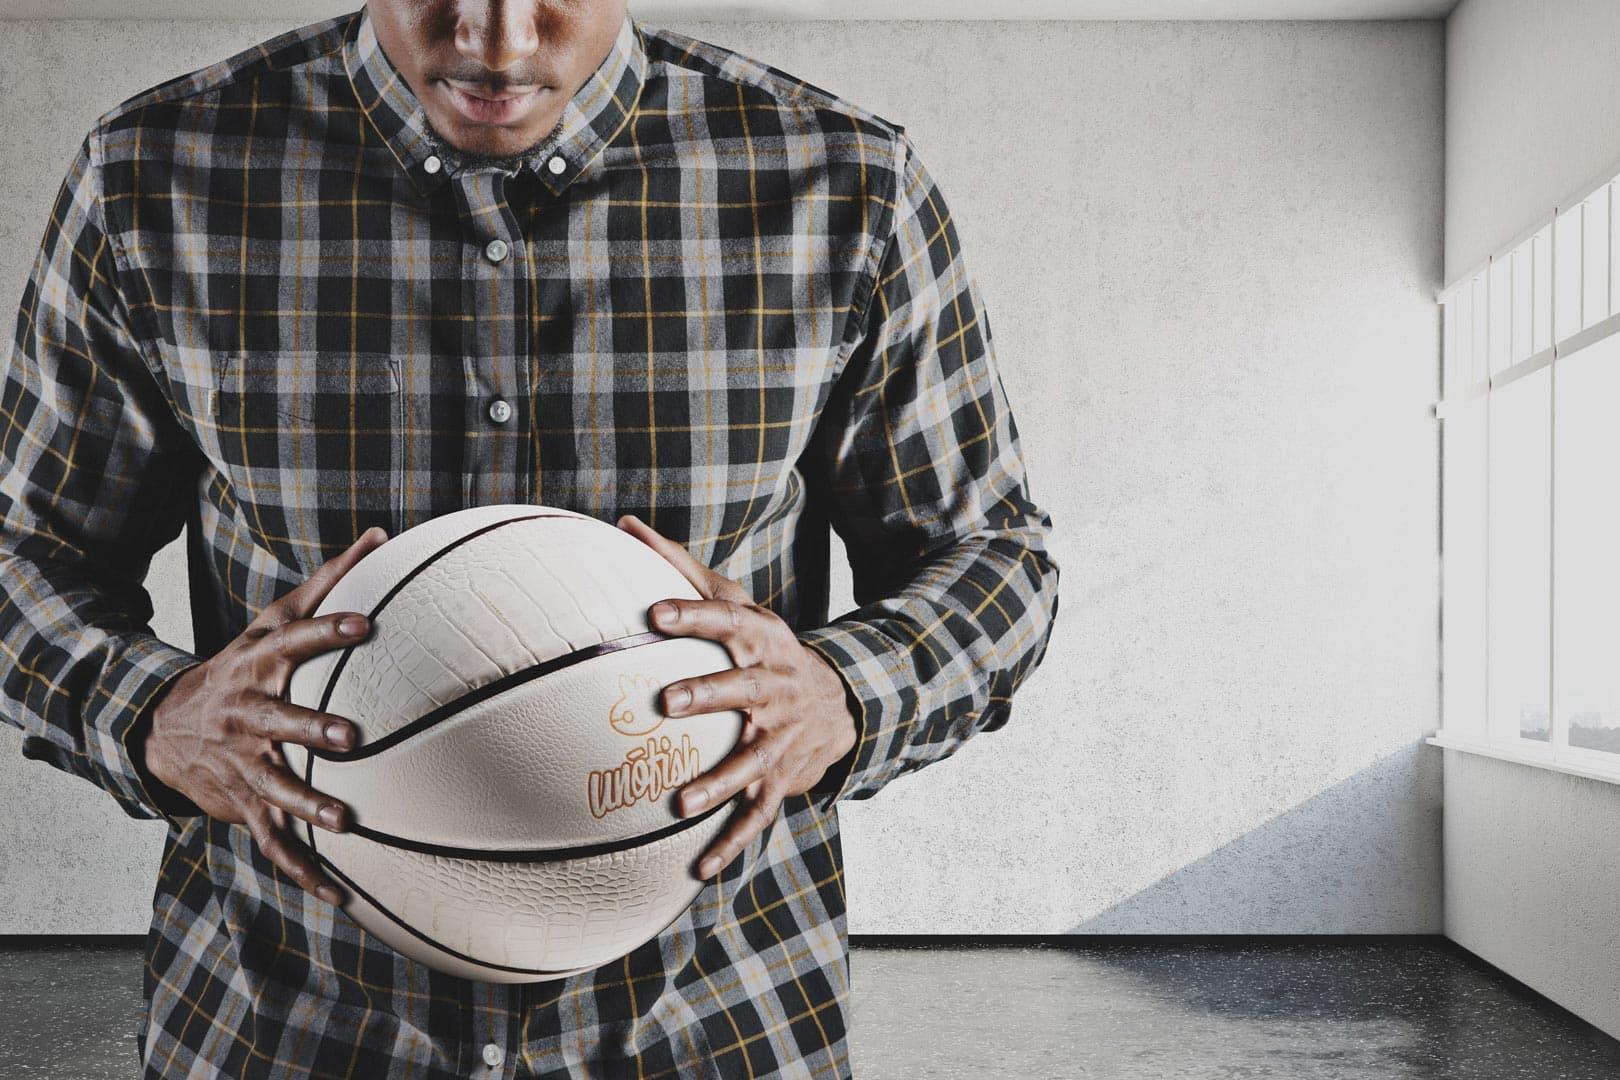 Unofish Creates a Line of Luxury Basketballs